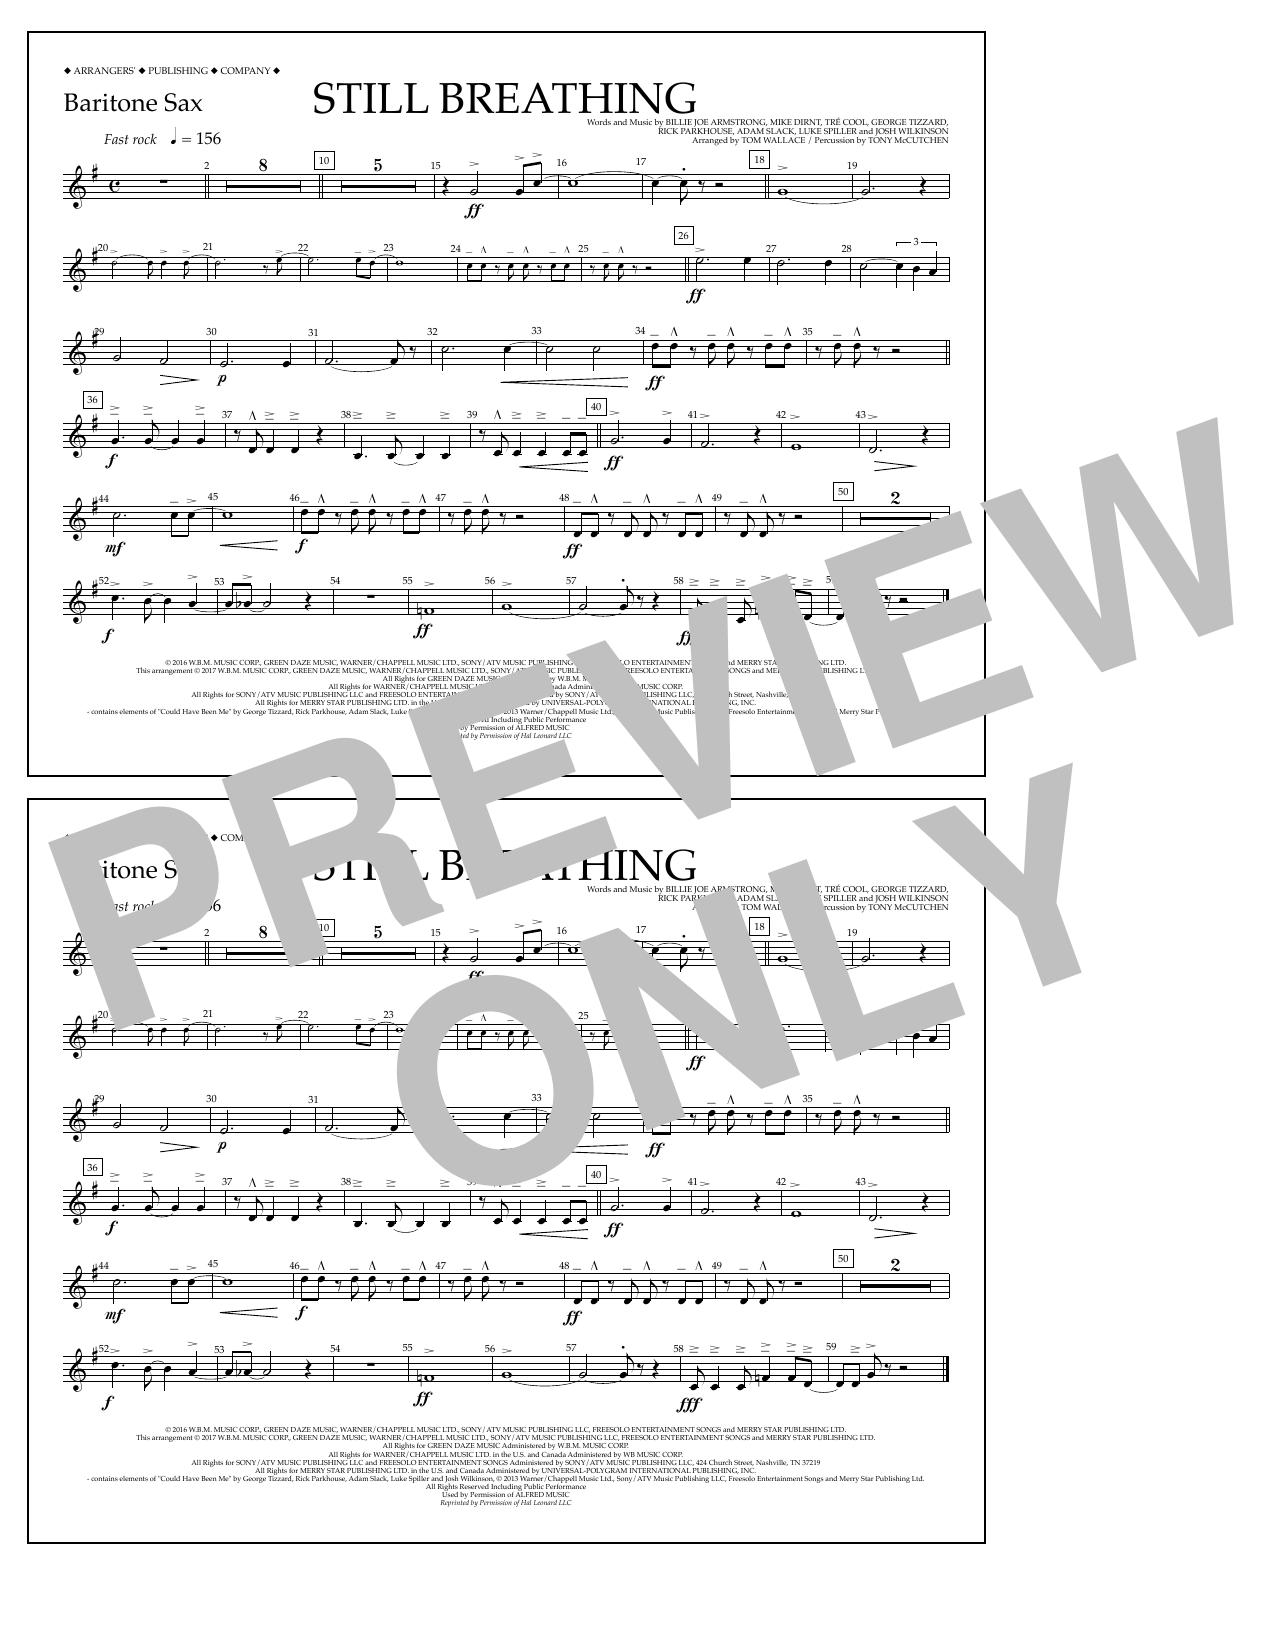 Still Breathing - Baritone Sax Sheet Music